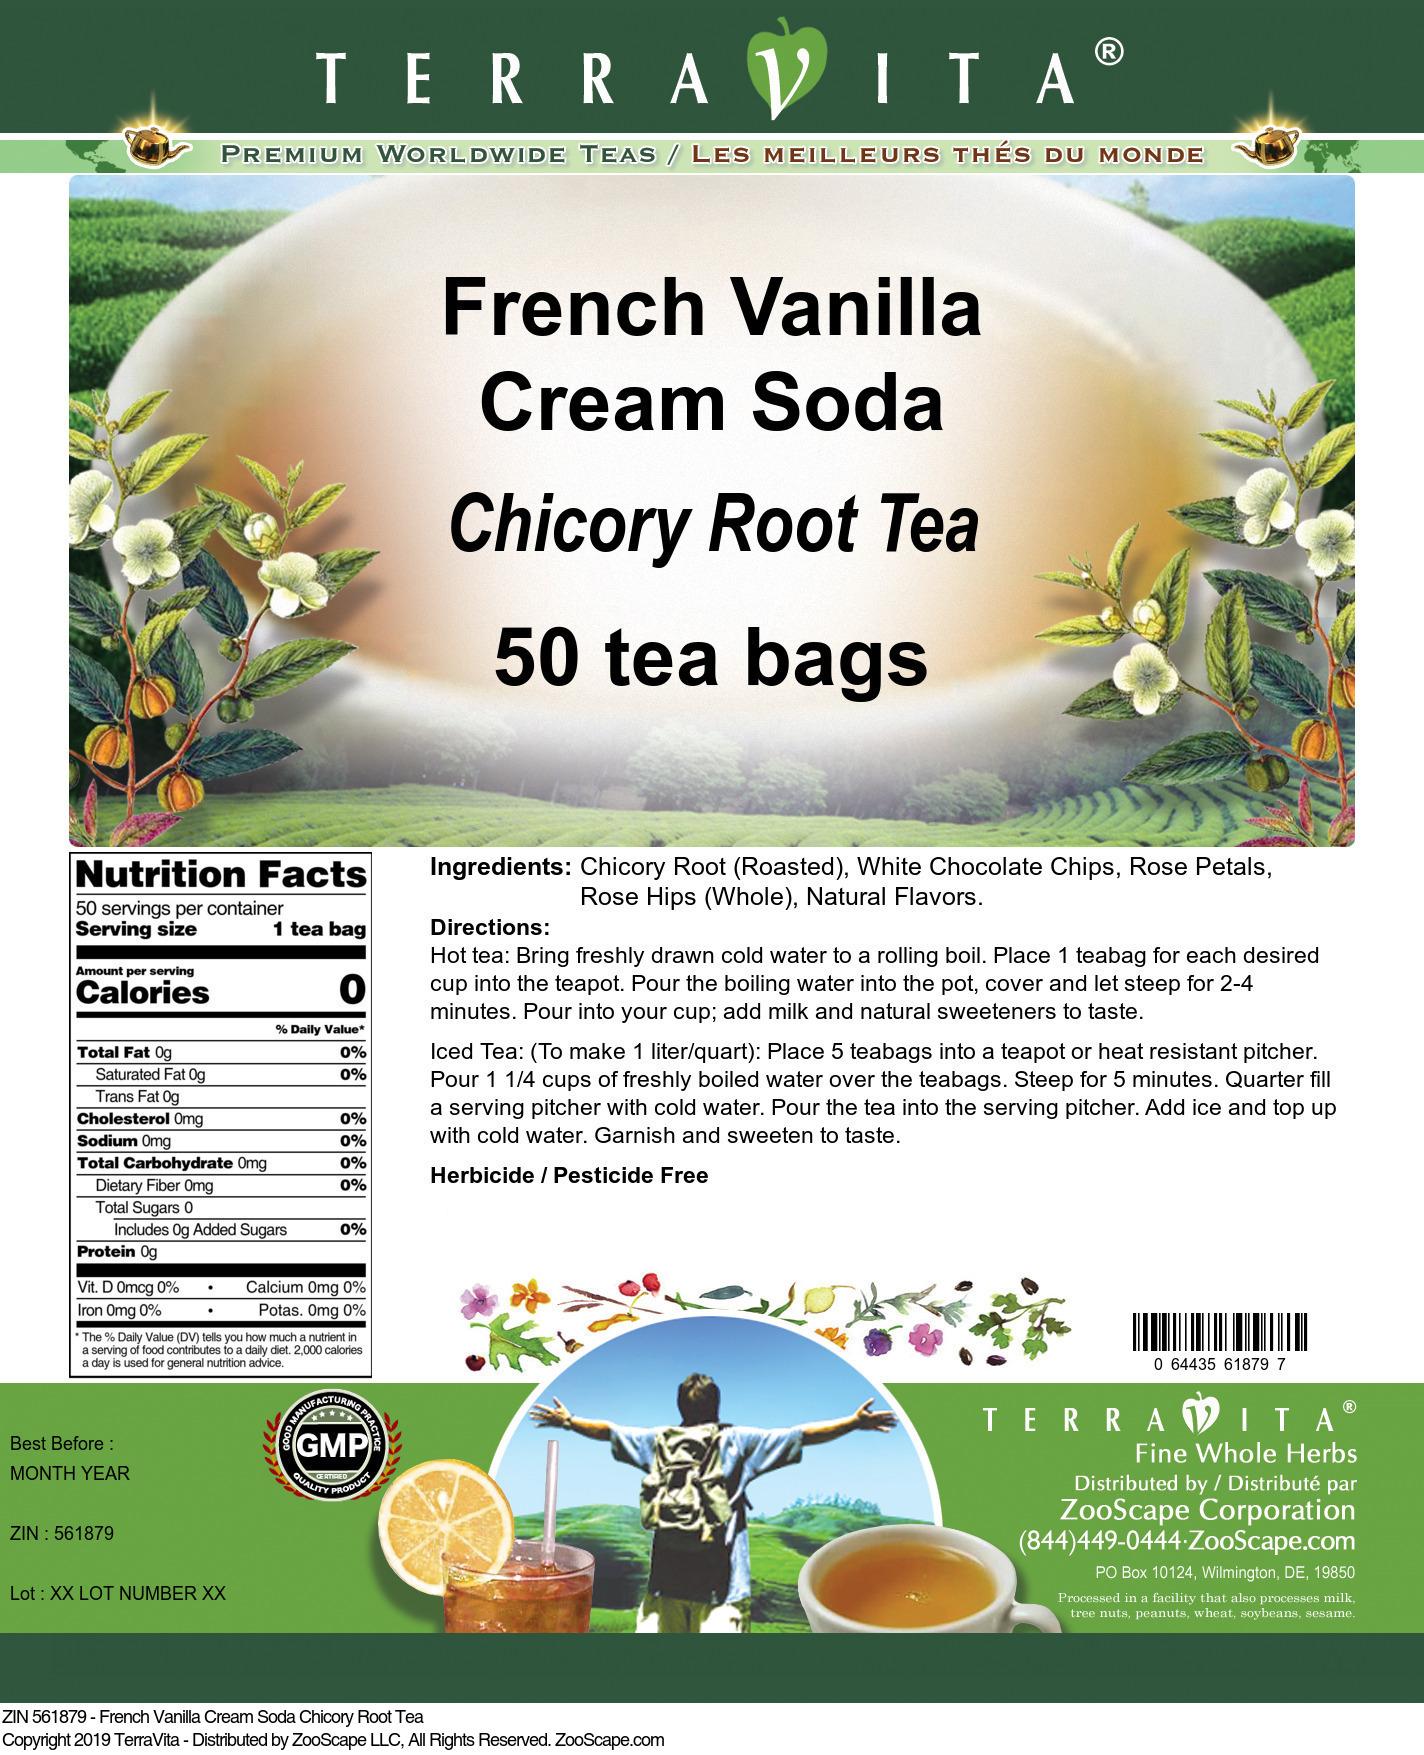 French Vanilla Cream Soda Chicory Root Tea